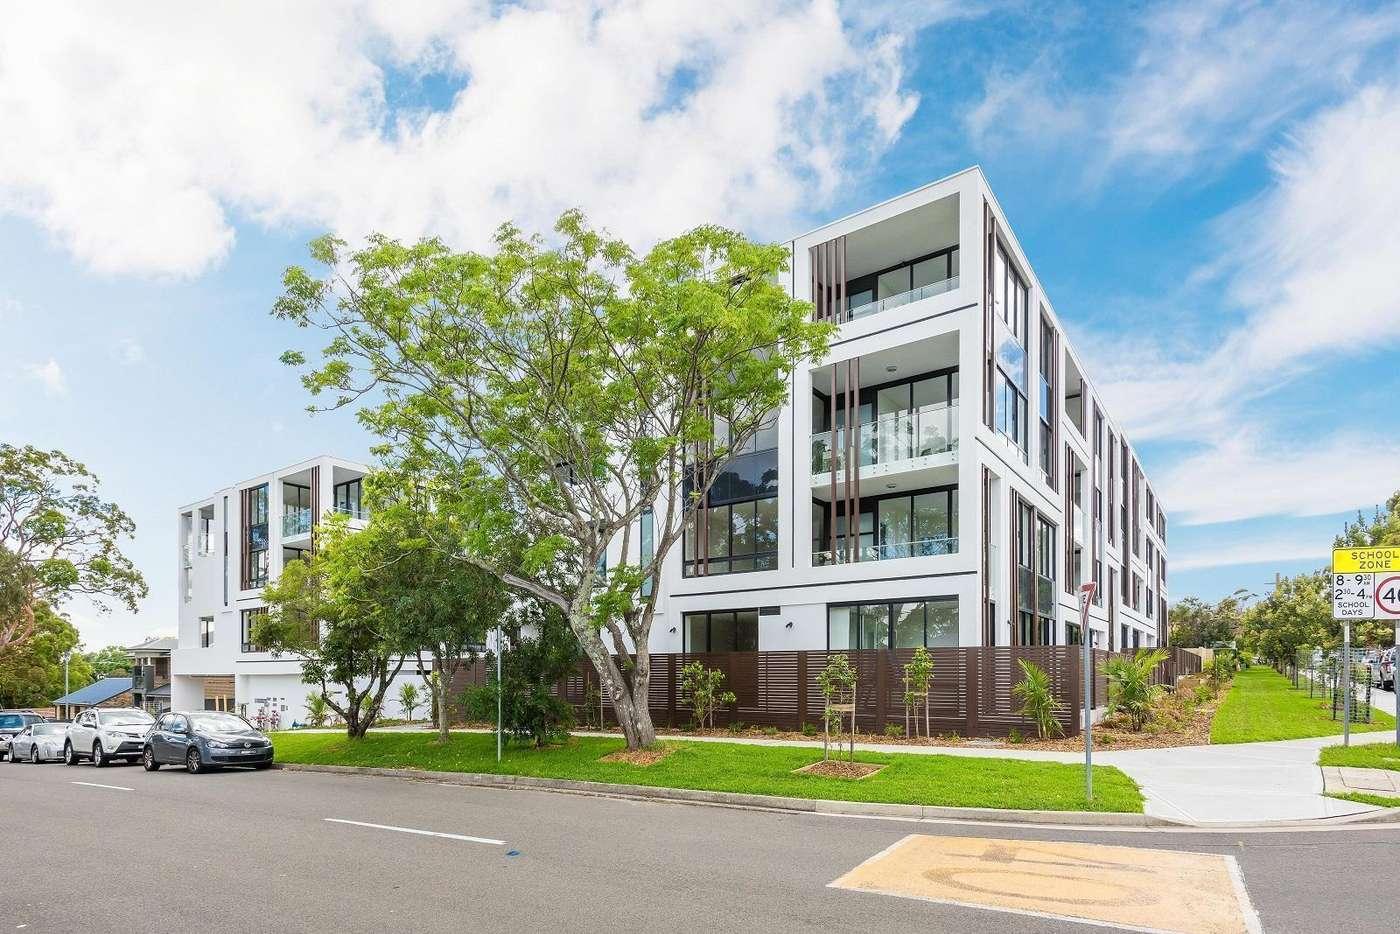 Main view of Homely apartment listing, 102/11 Veno, Heathcote NSW 2233